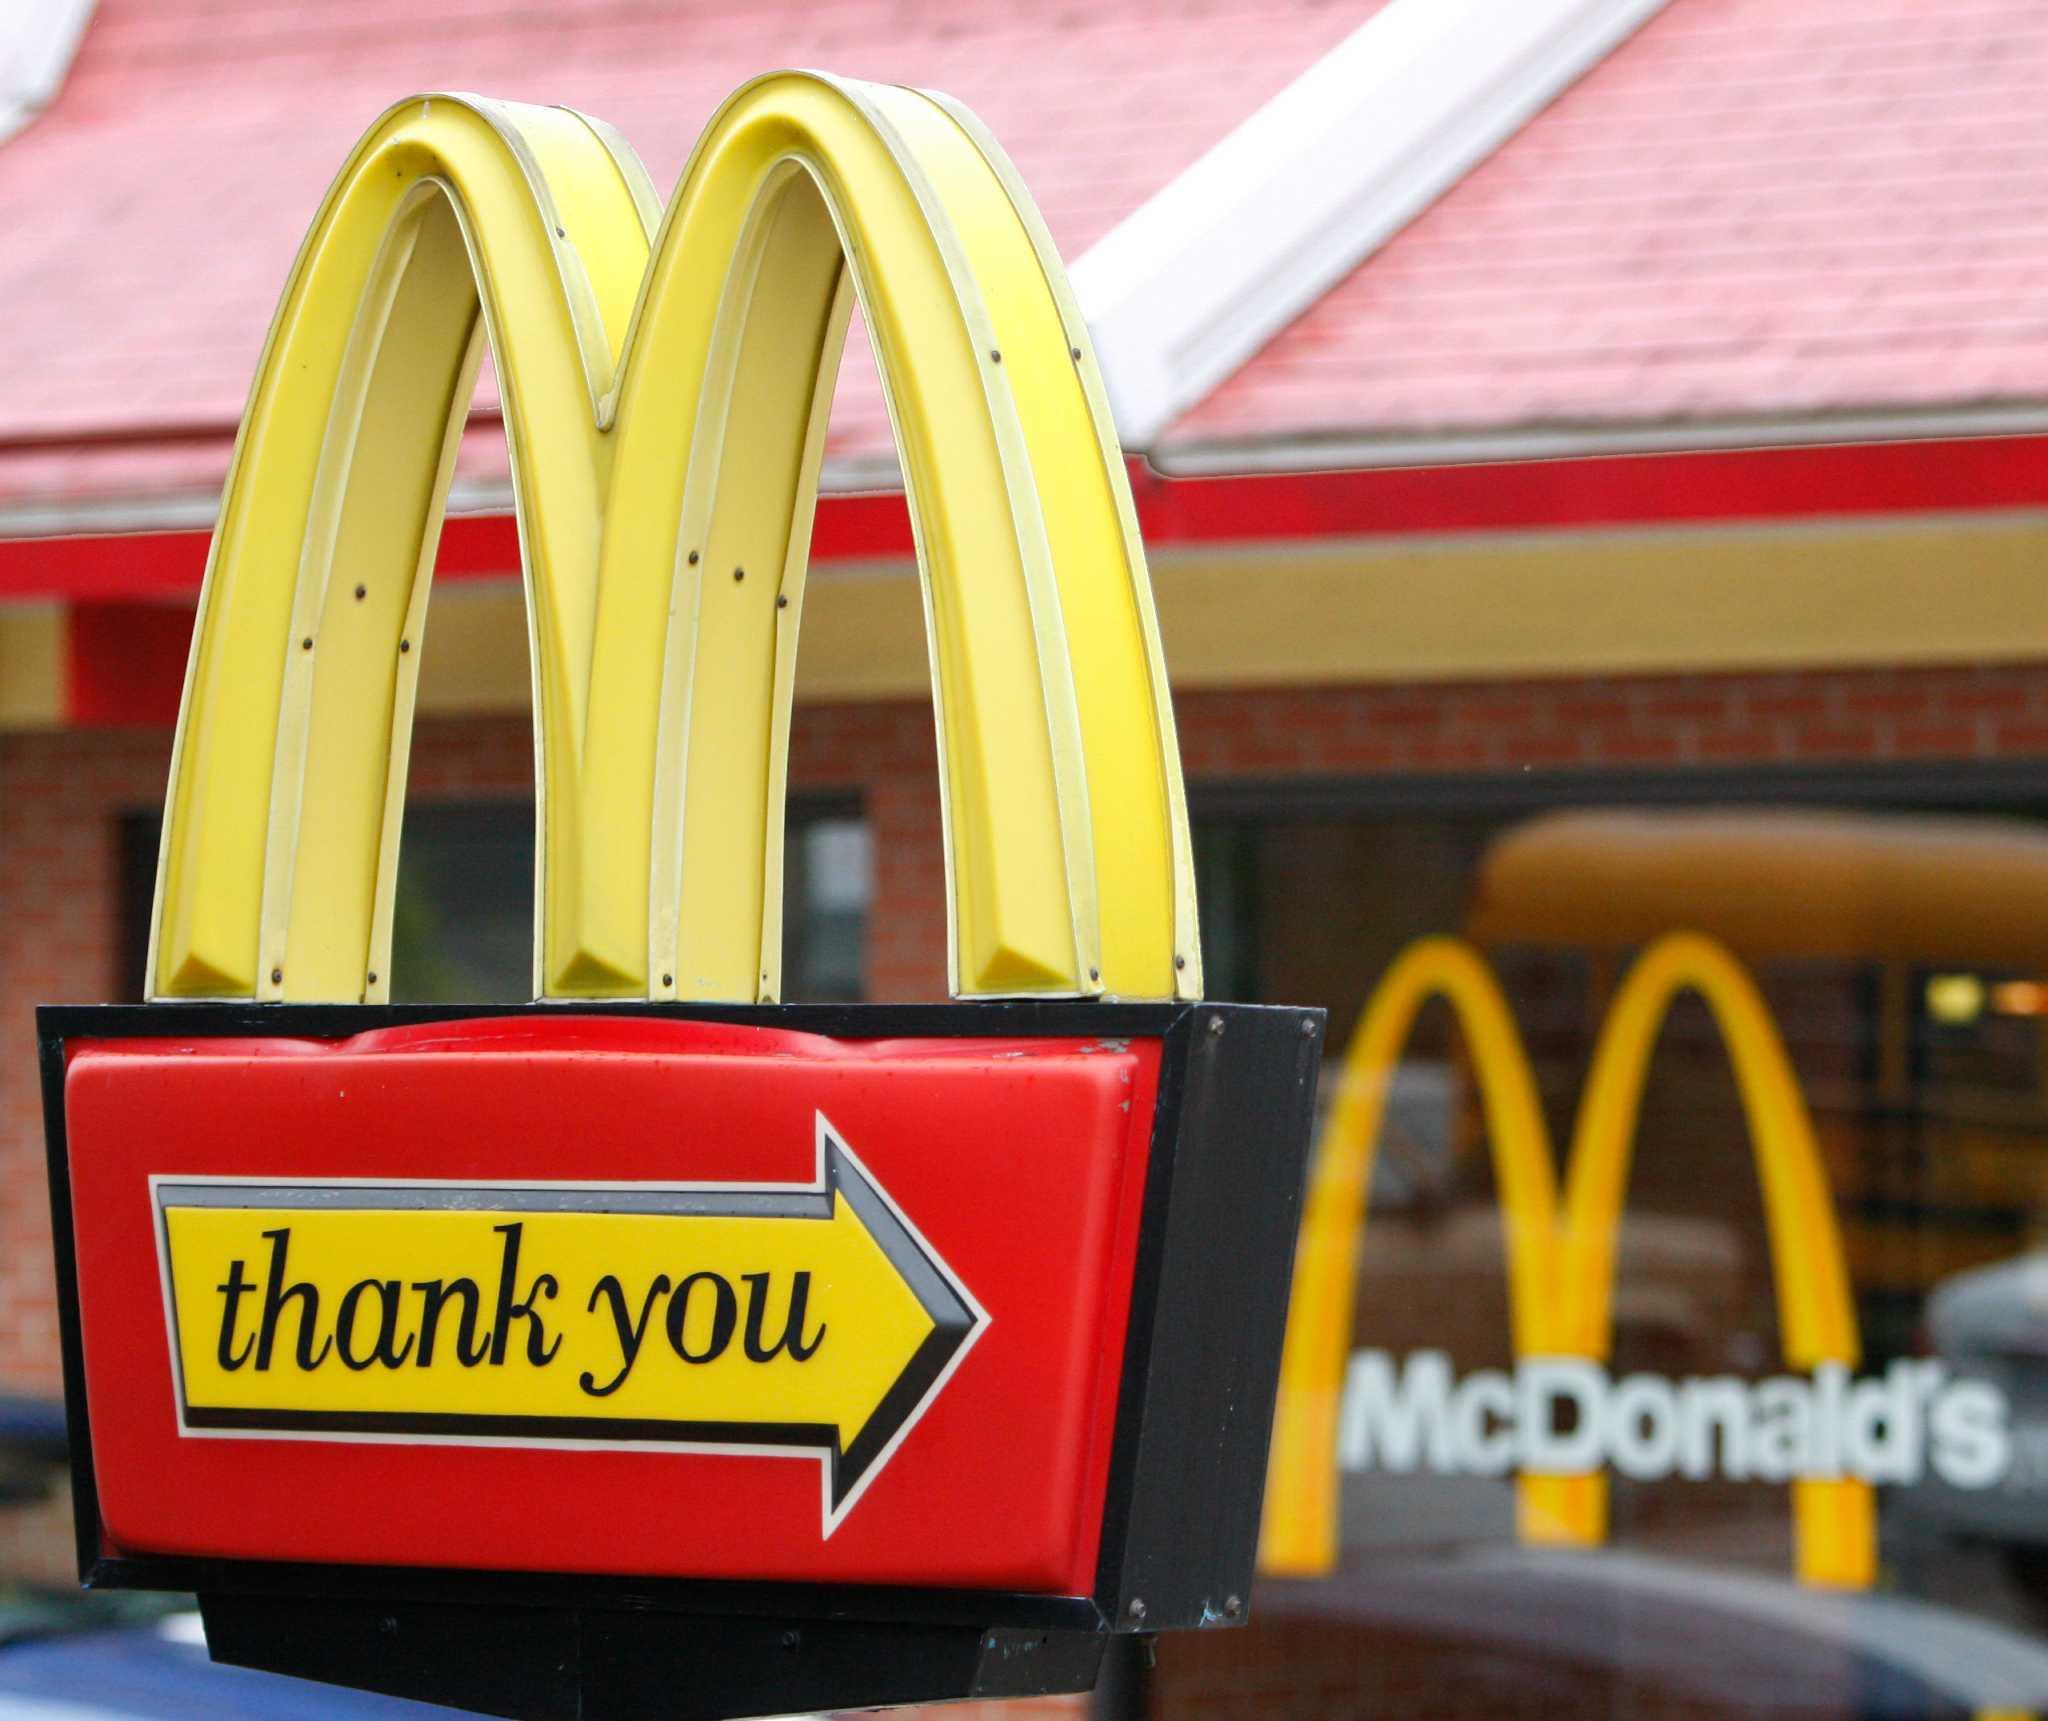 mcdonalds make winning decisions - HD2048×1721